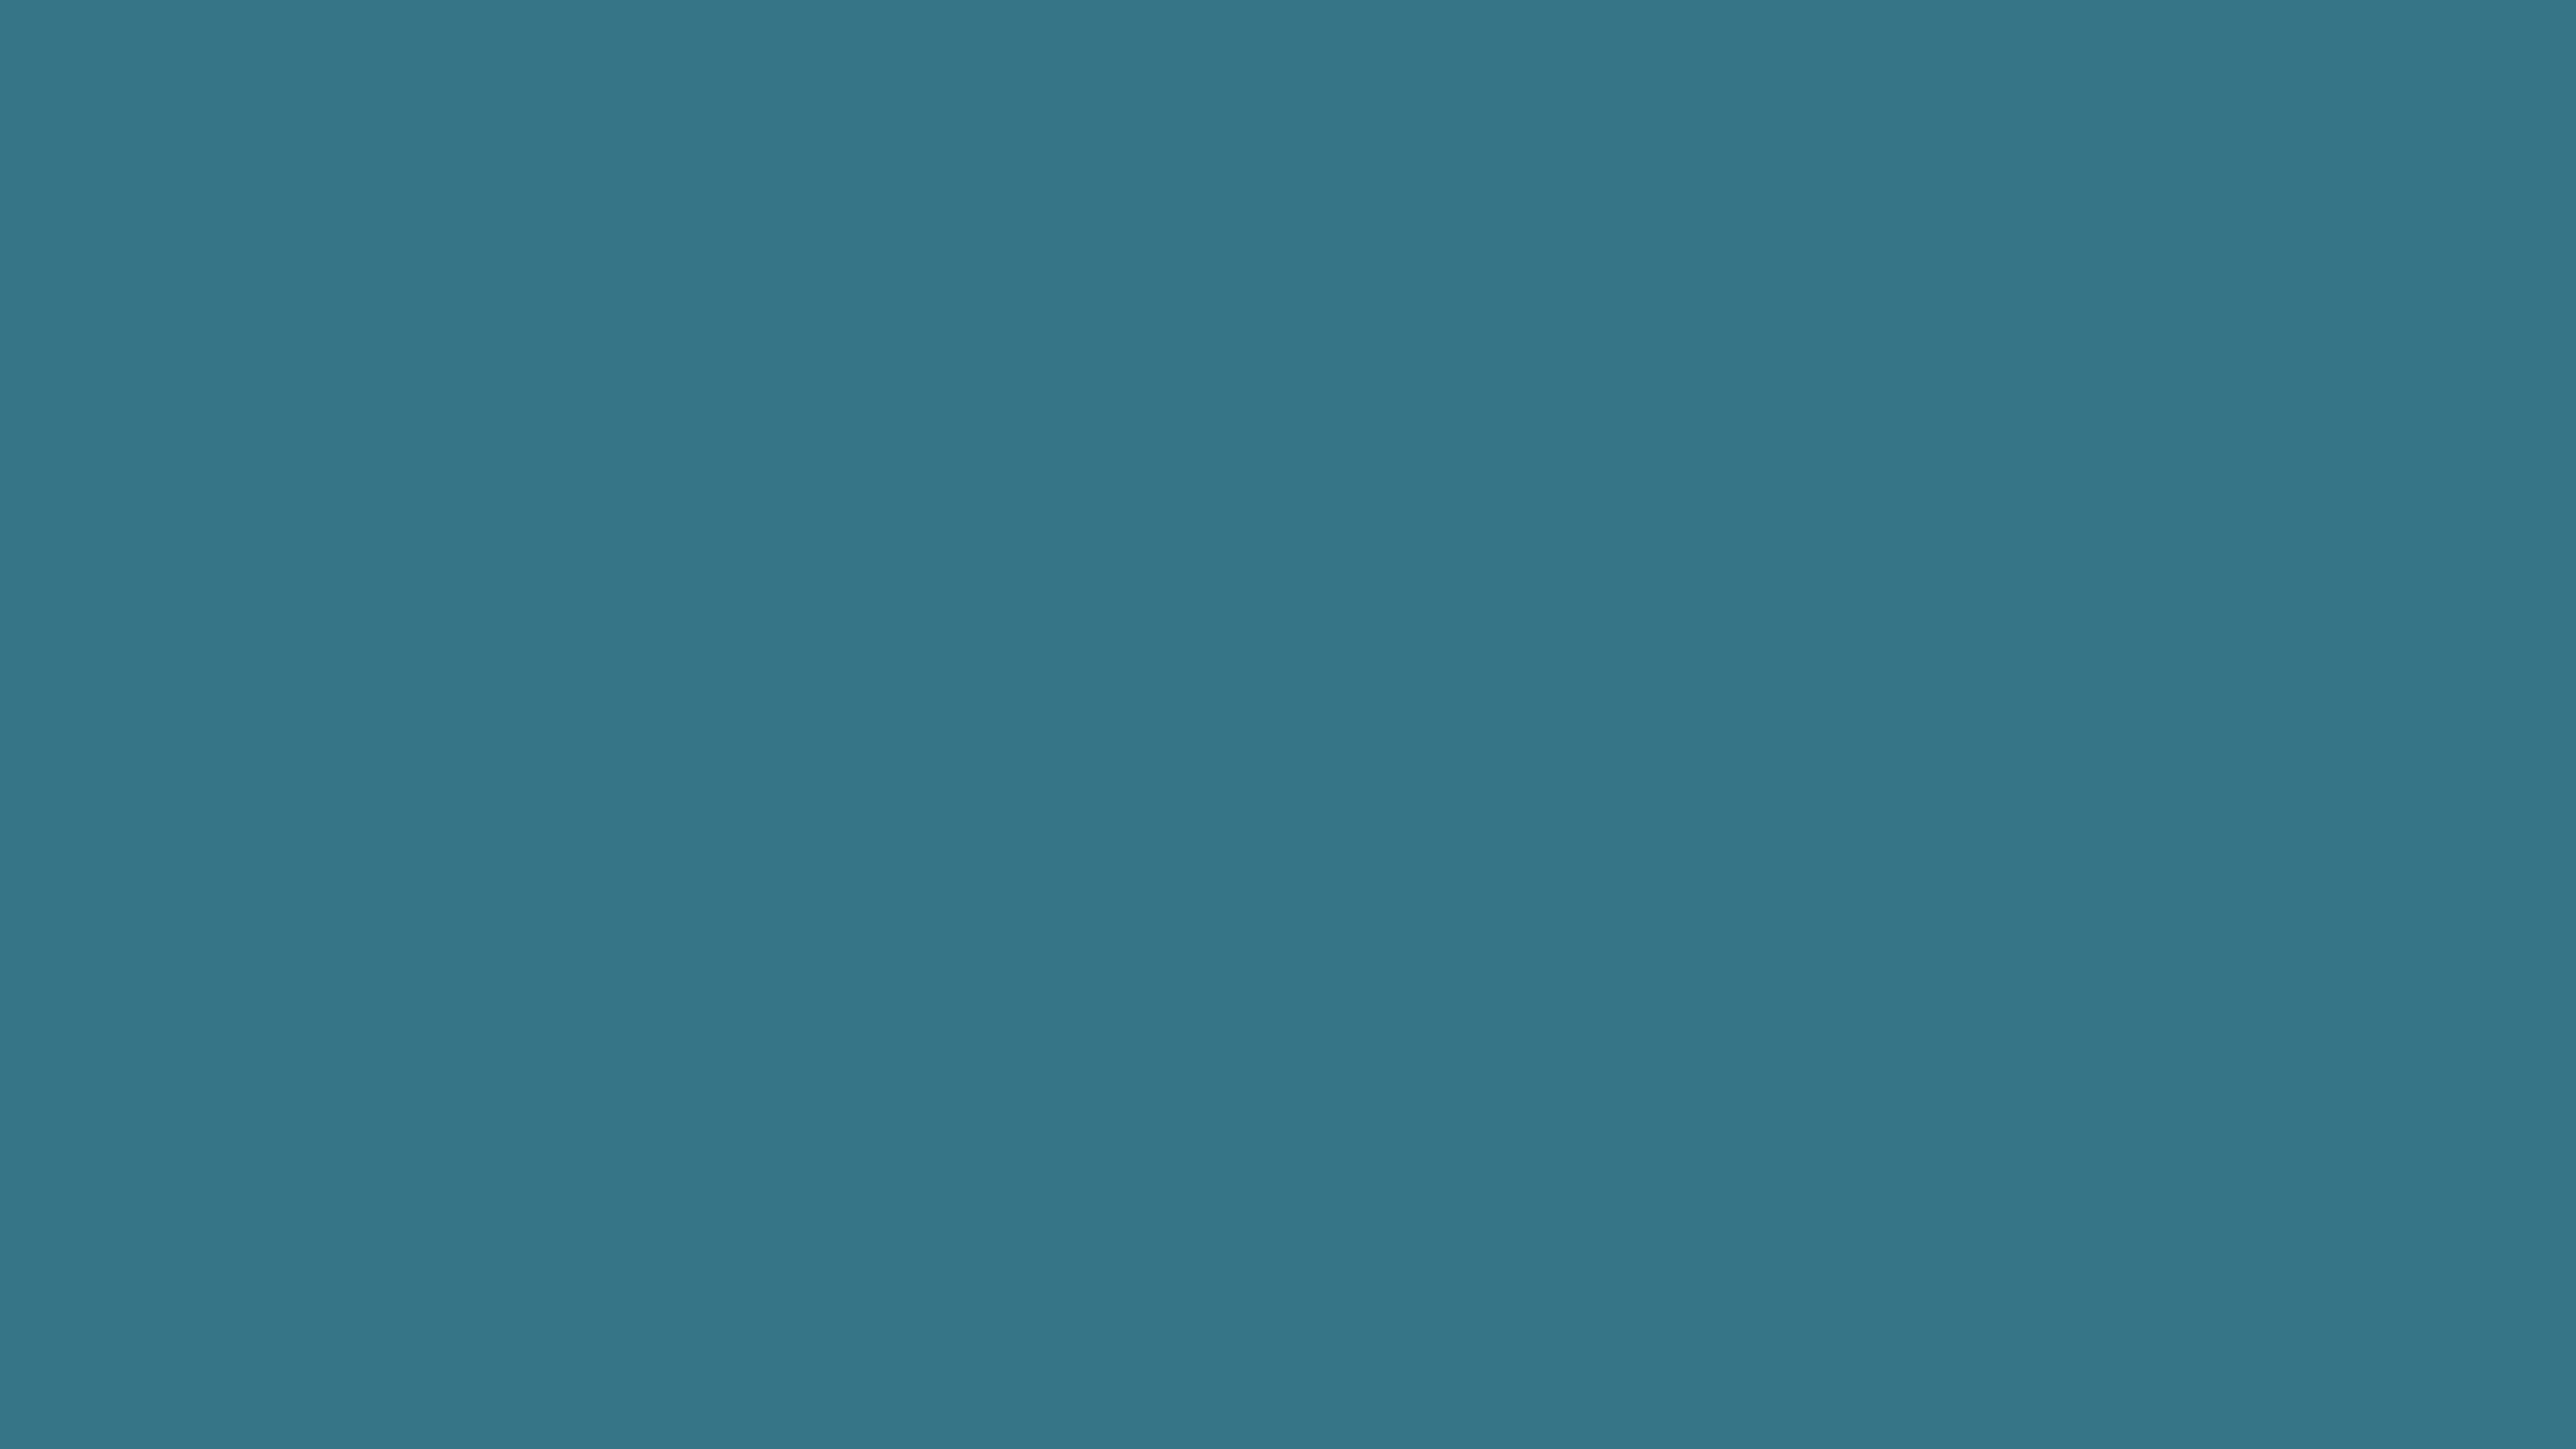 4096x2304 Teal Blue Solid Color Background